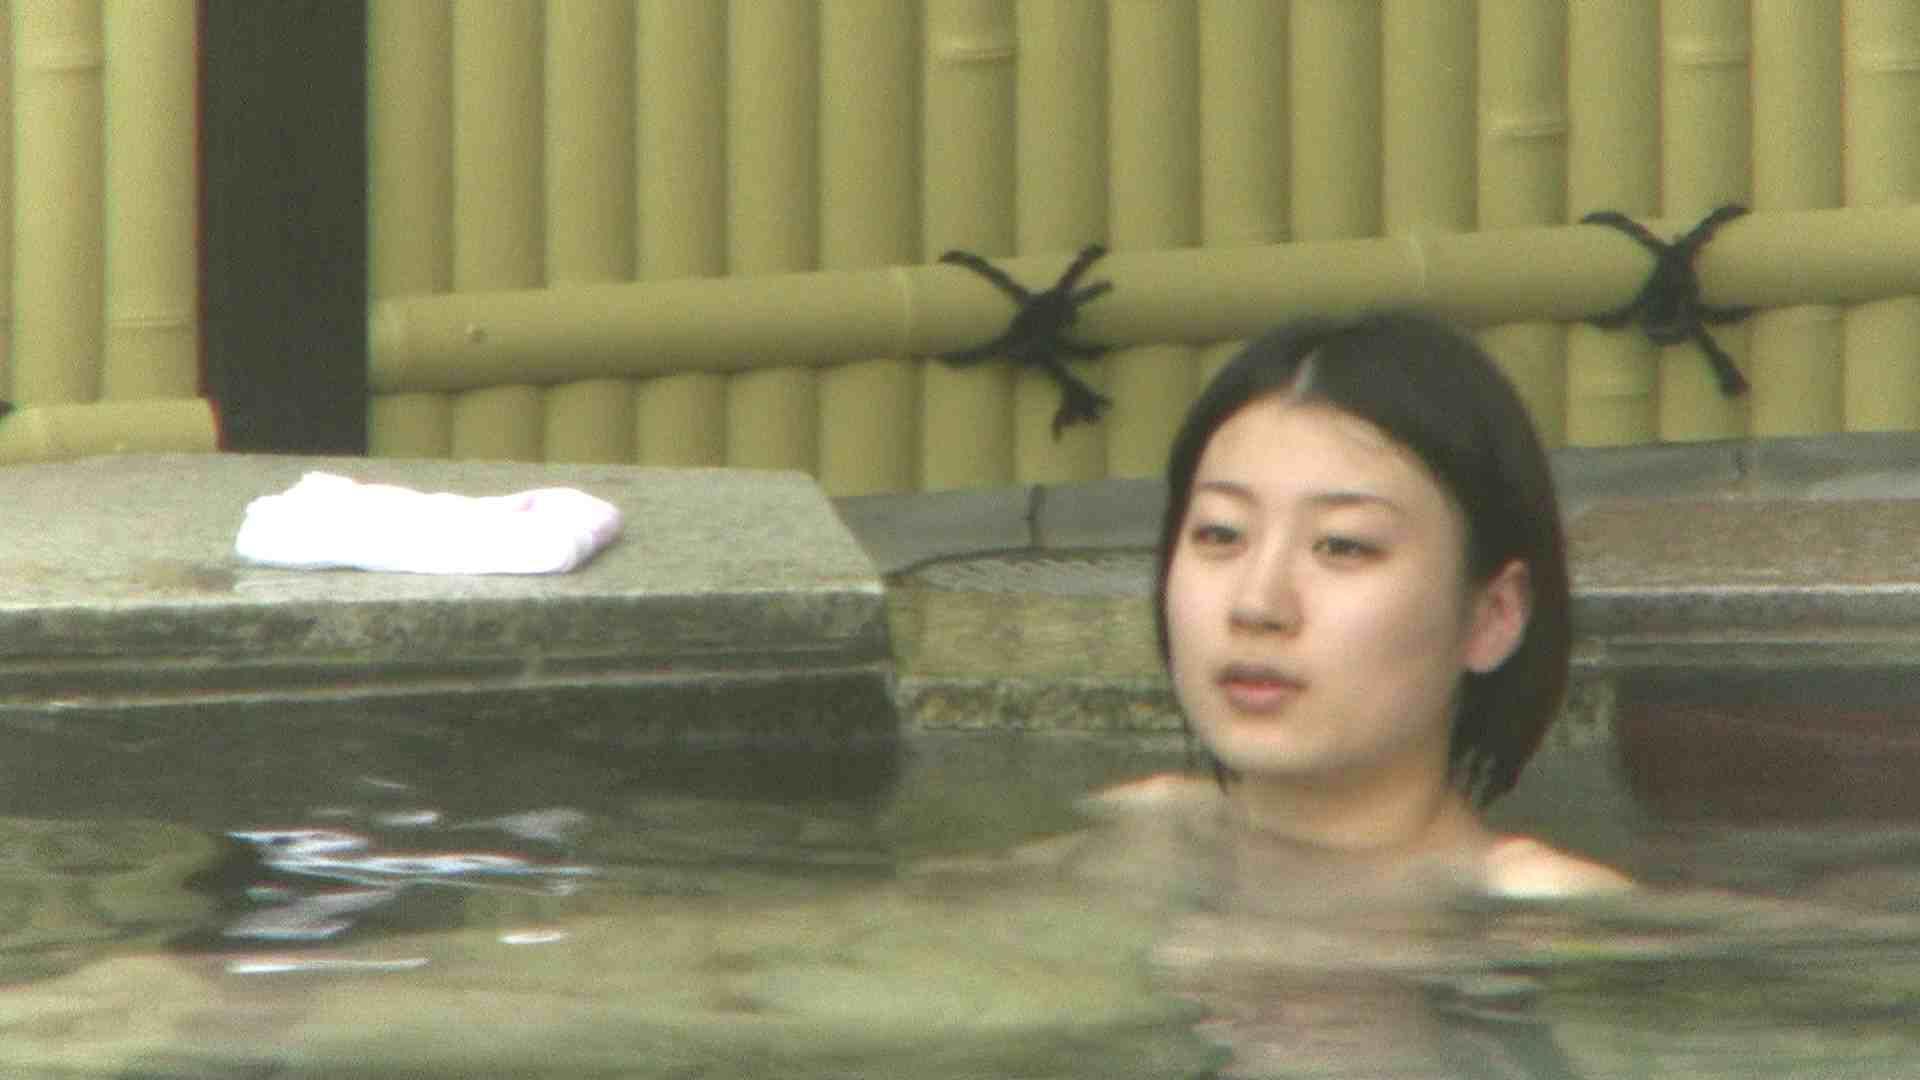 Aquaな露天風呂Vol.123 盗撮師作品 エロ画像 105pic 5